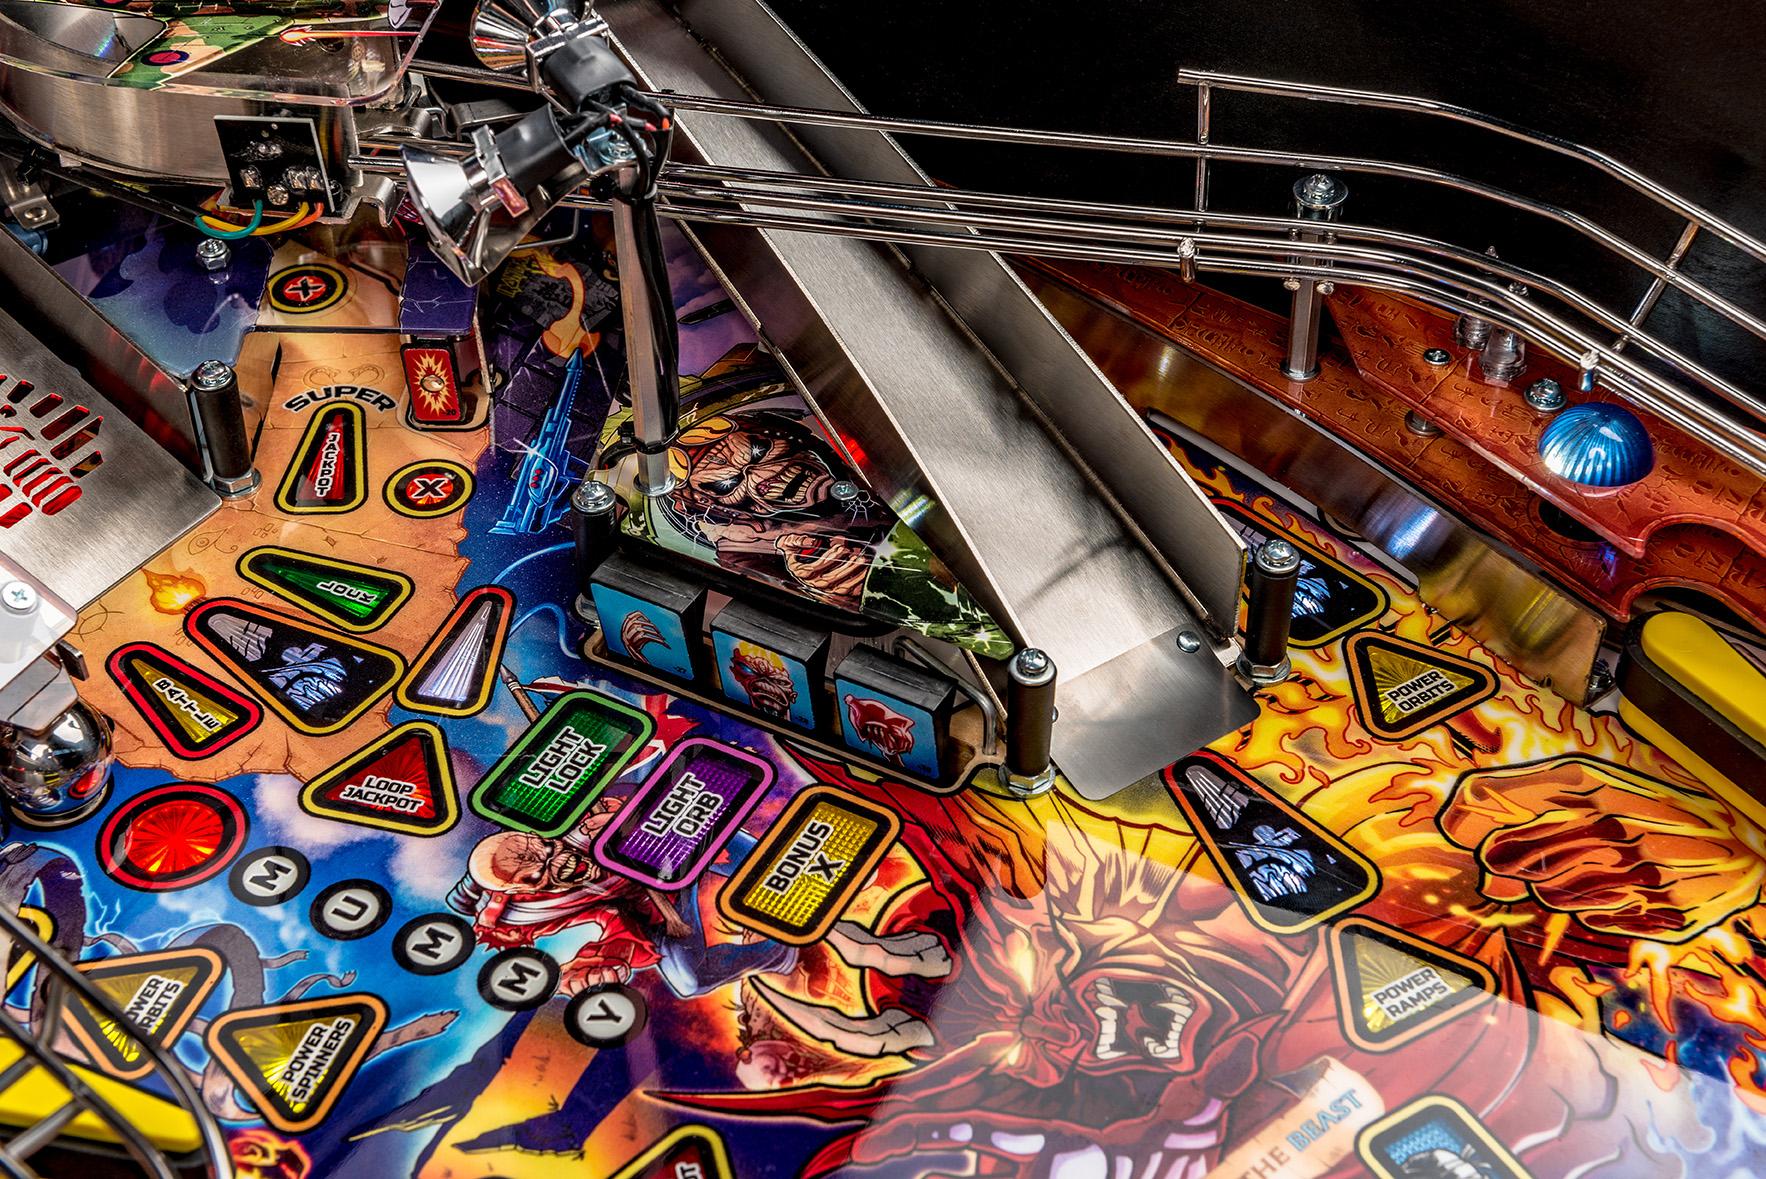 Iron-Maiden-Pinball-Machine-26a